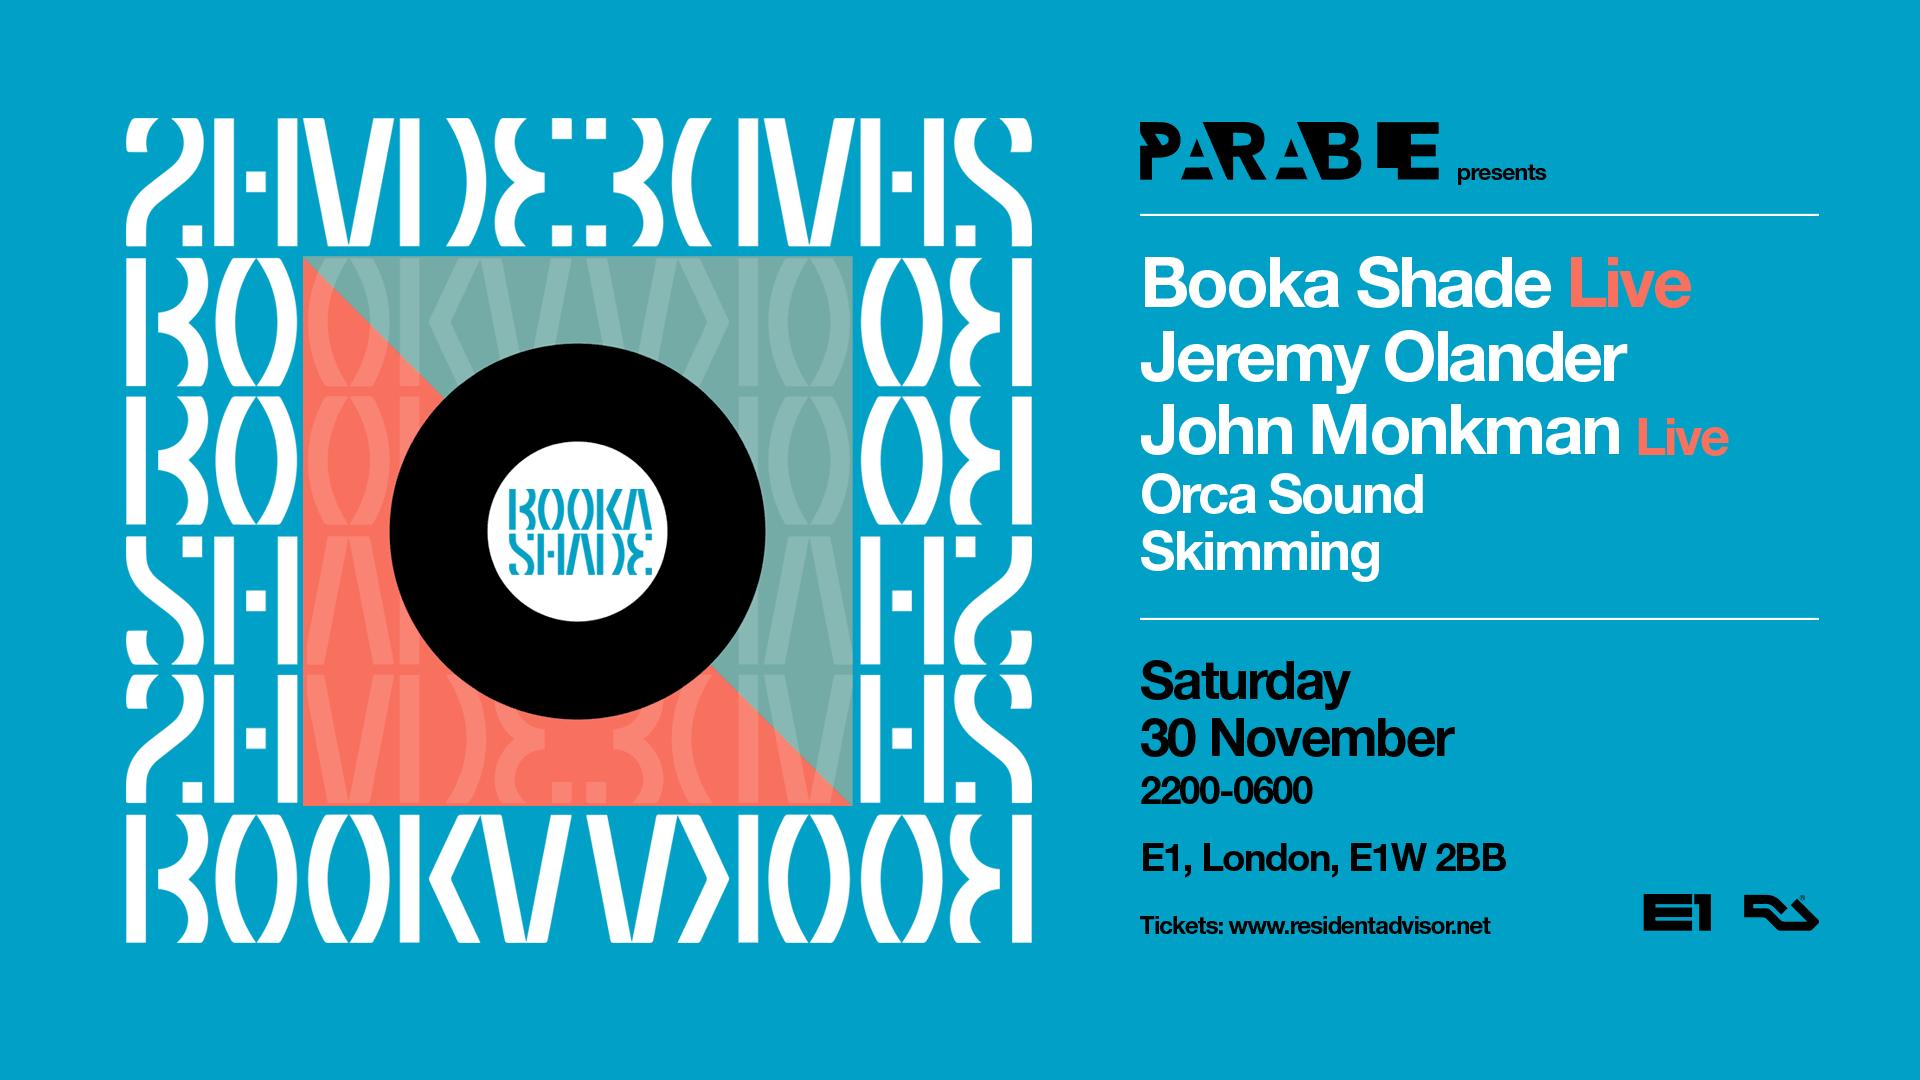 Booka Shade Live, Jeremy Olander, John Monkman Live – E1 London